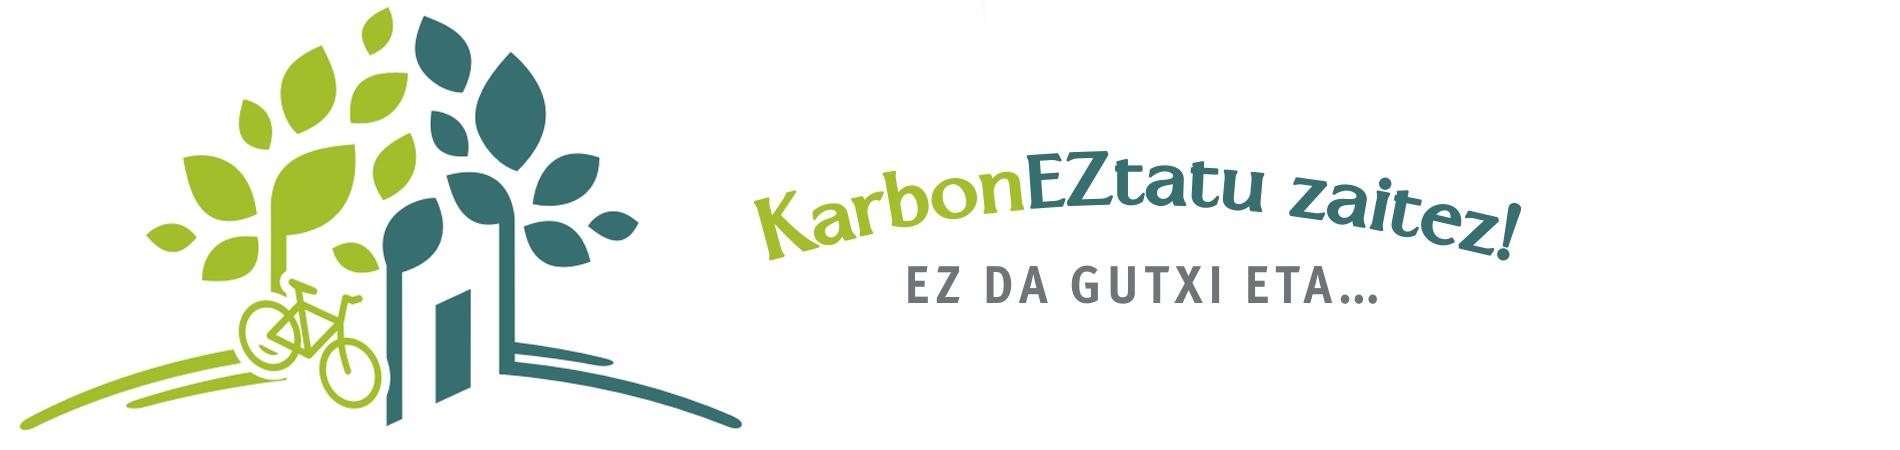 #Kabezeroa